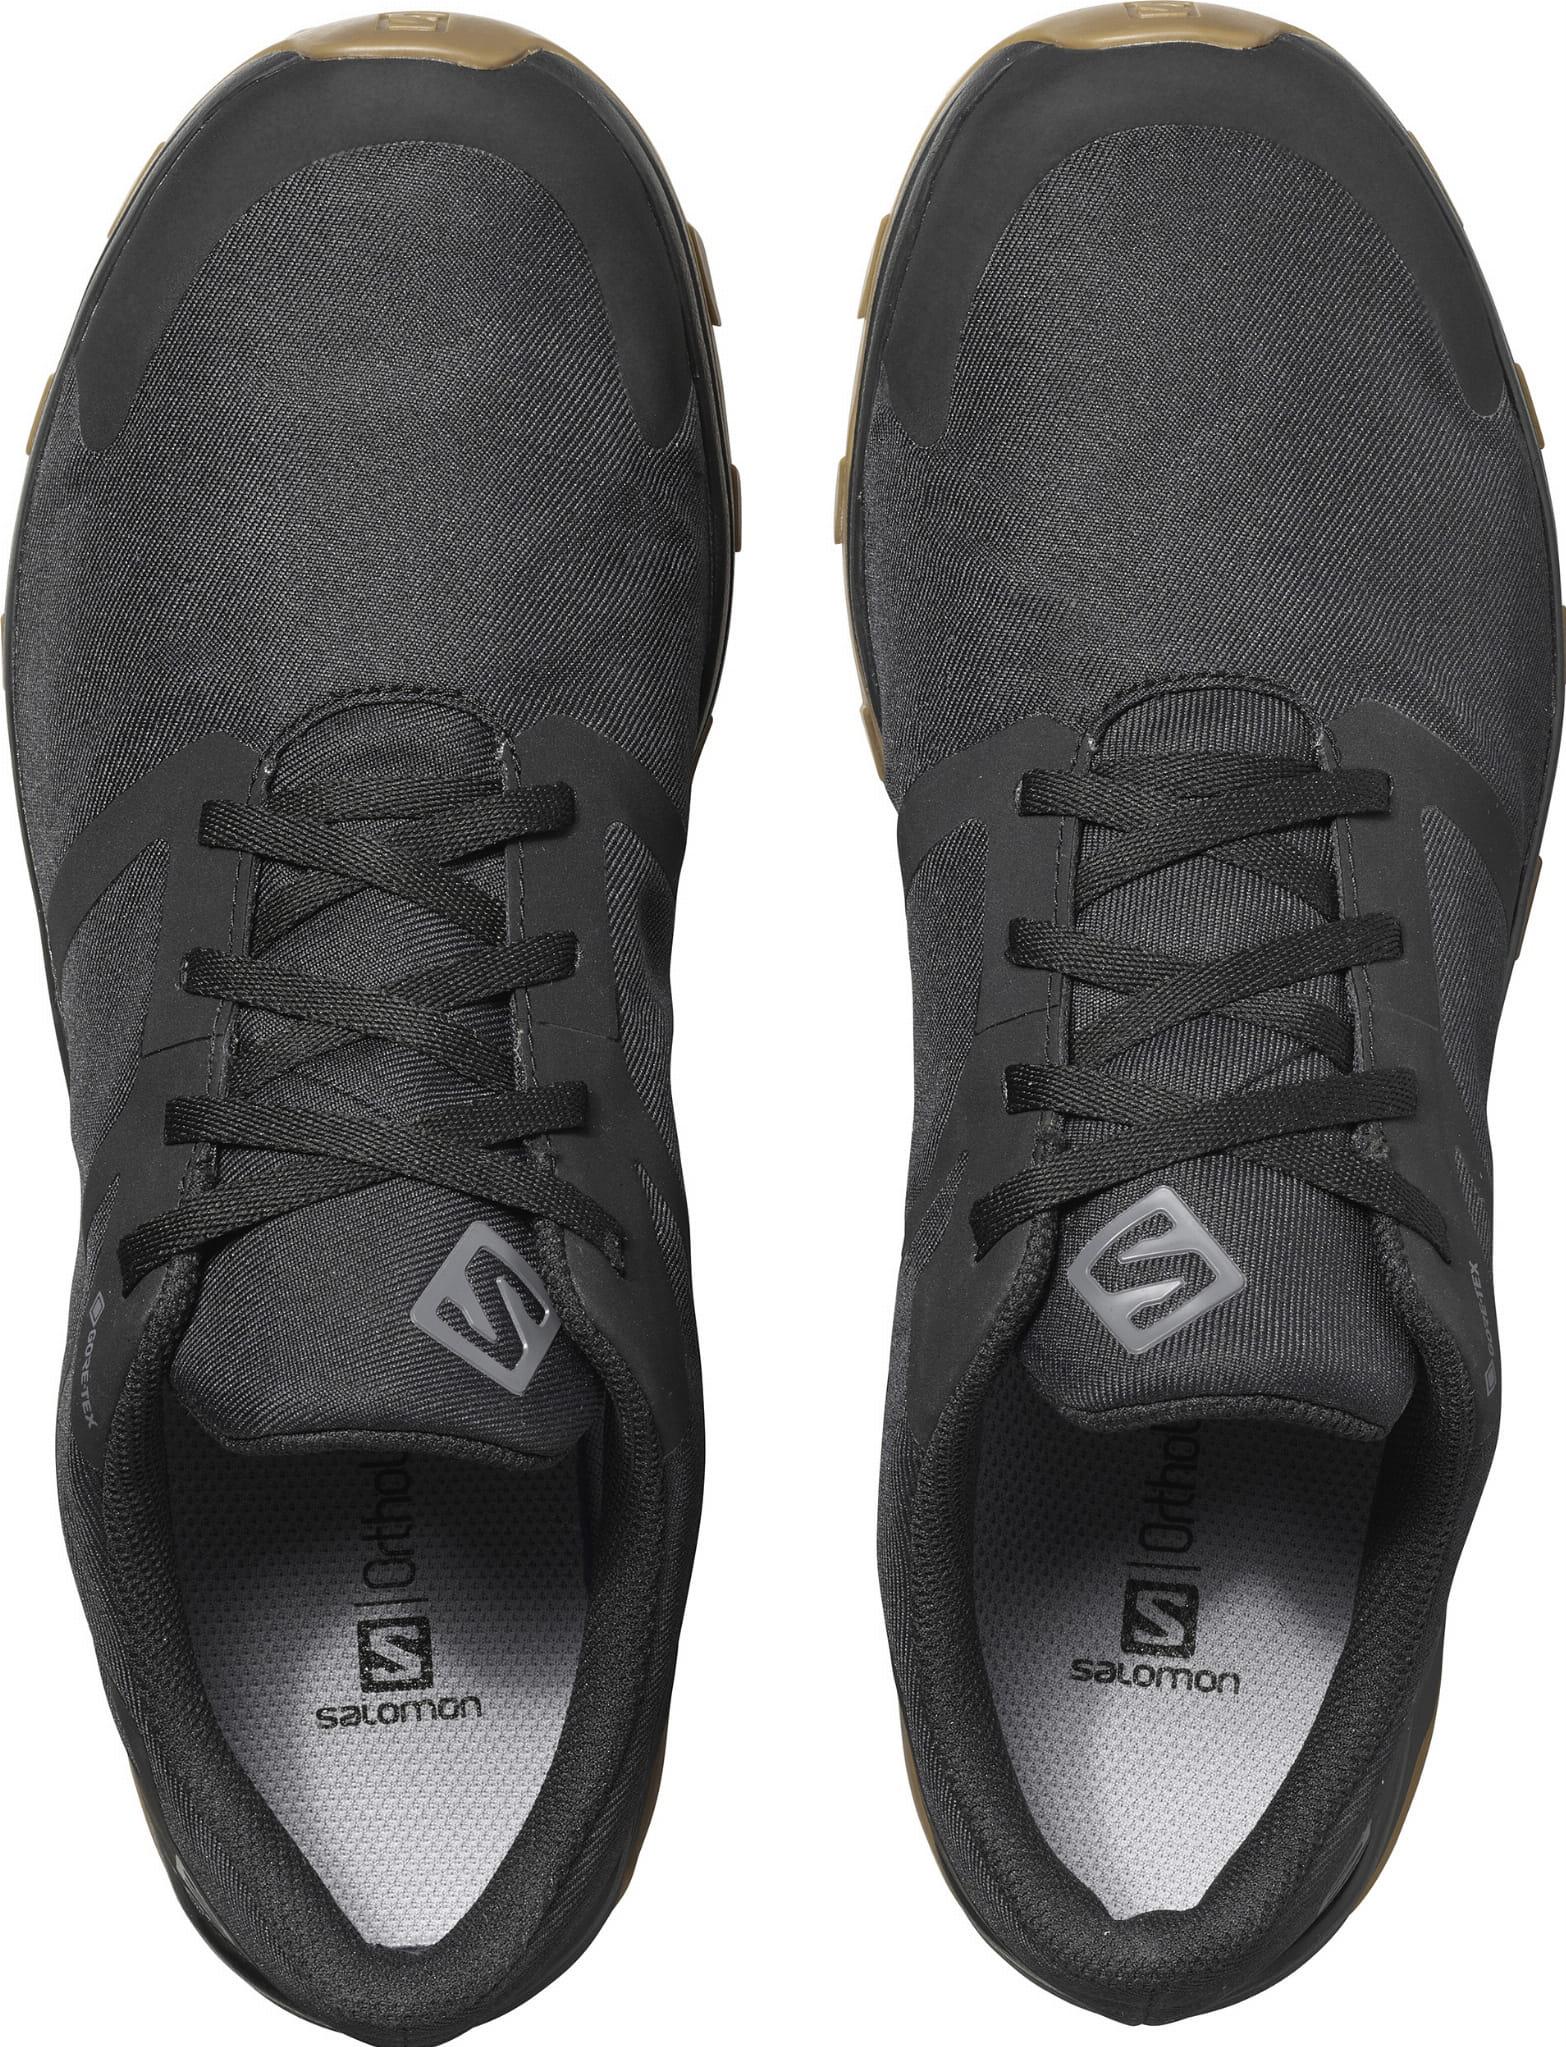 Buty Salomon OUTbound GTX Black 407917